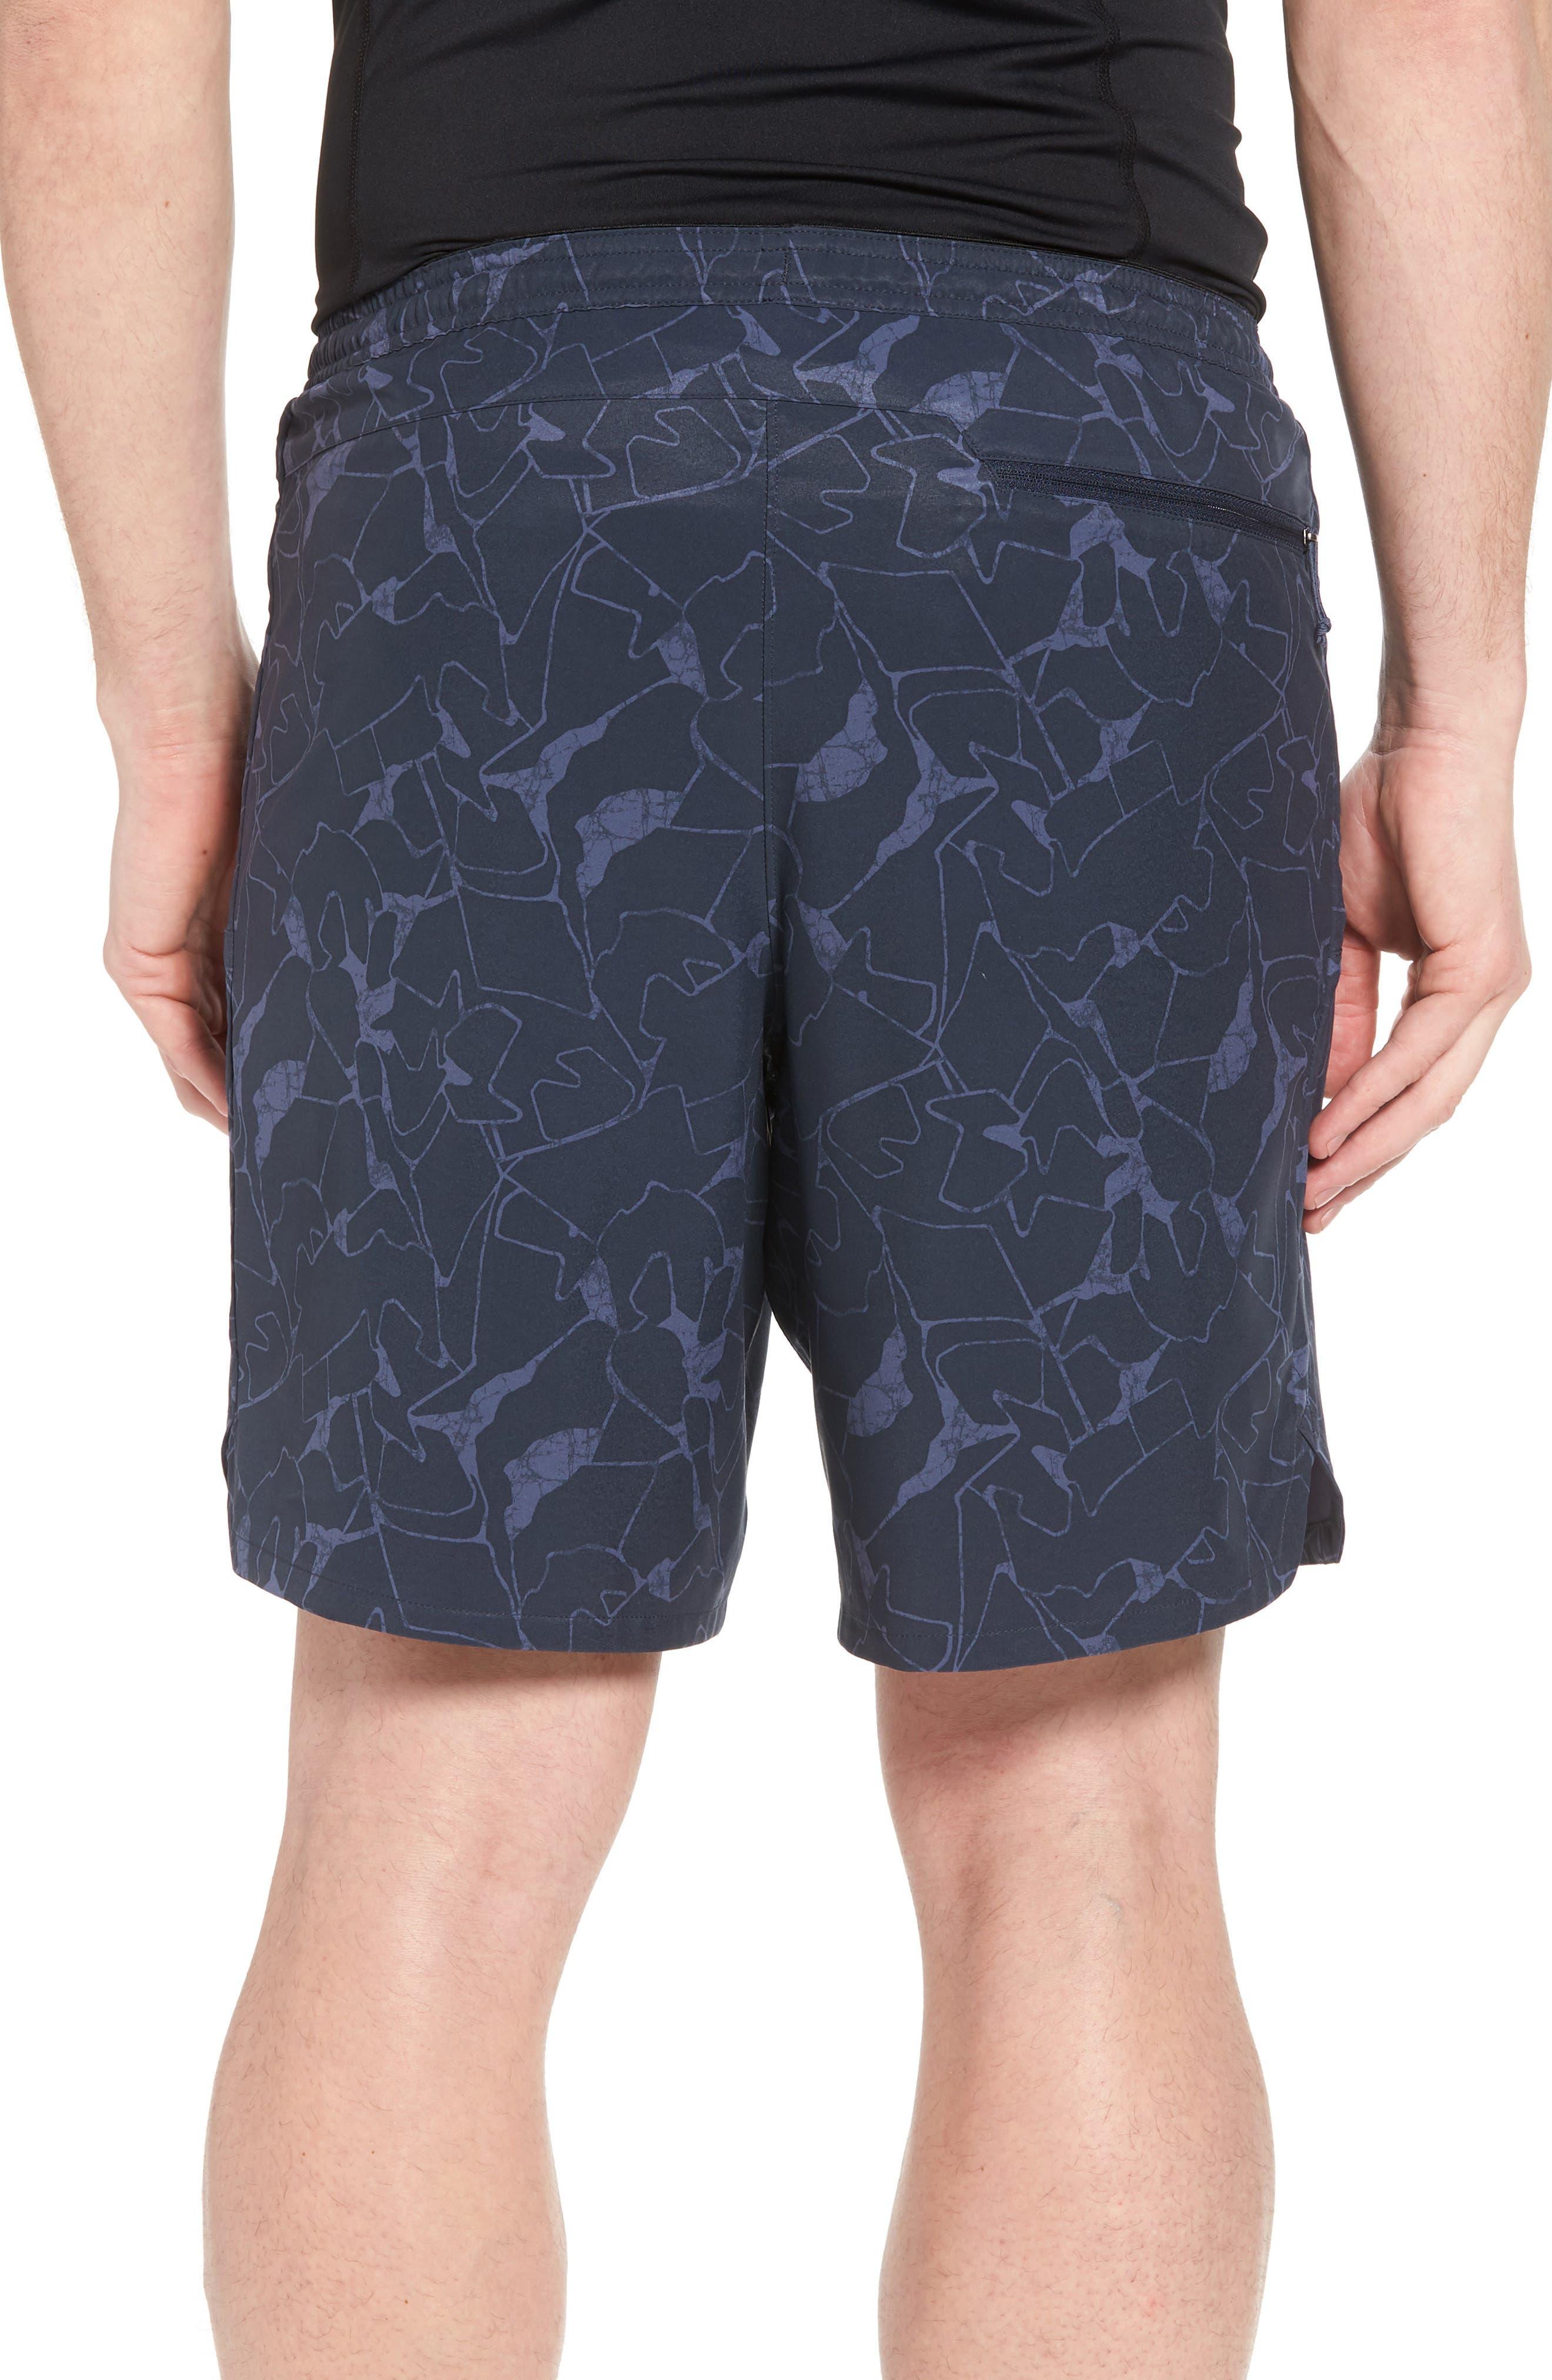 Nine Trails Hiking Shorts,                             Alternate thumbnail 2, color,                             Rock Jigsaw/ Smolder Blue